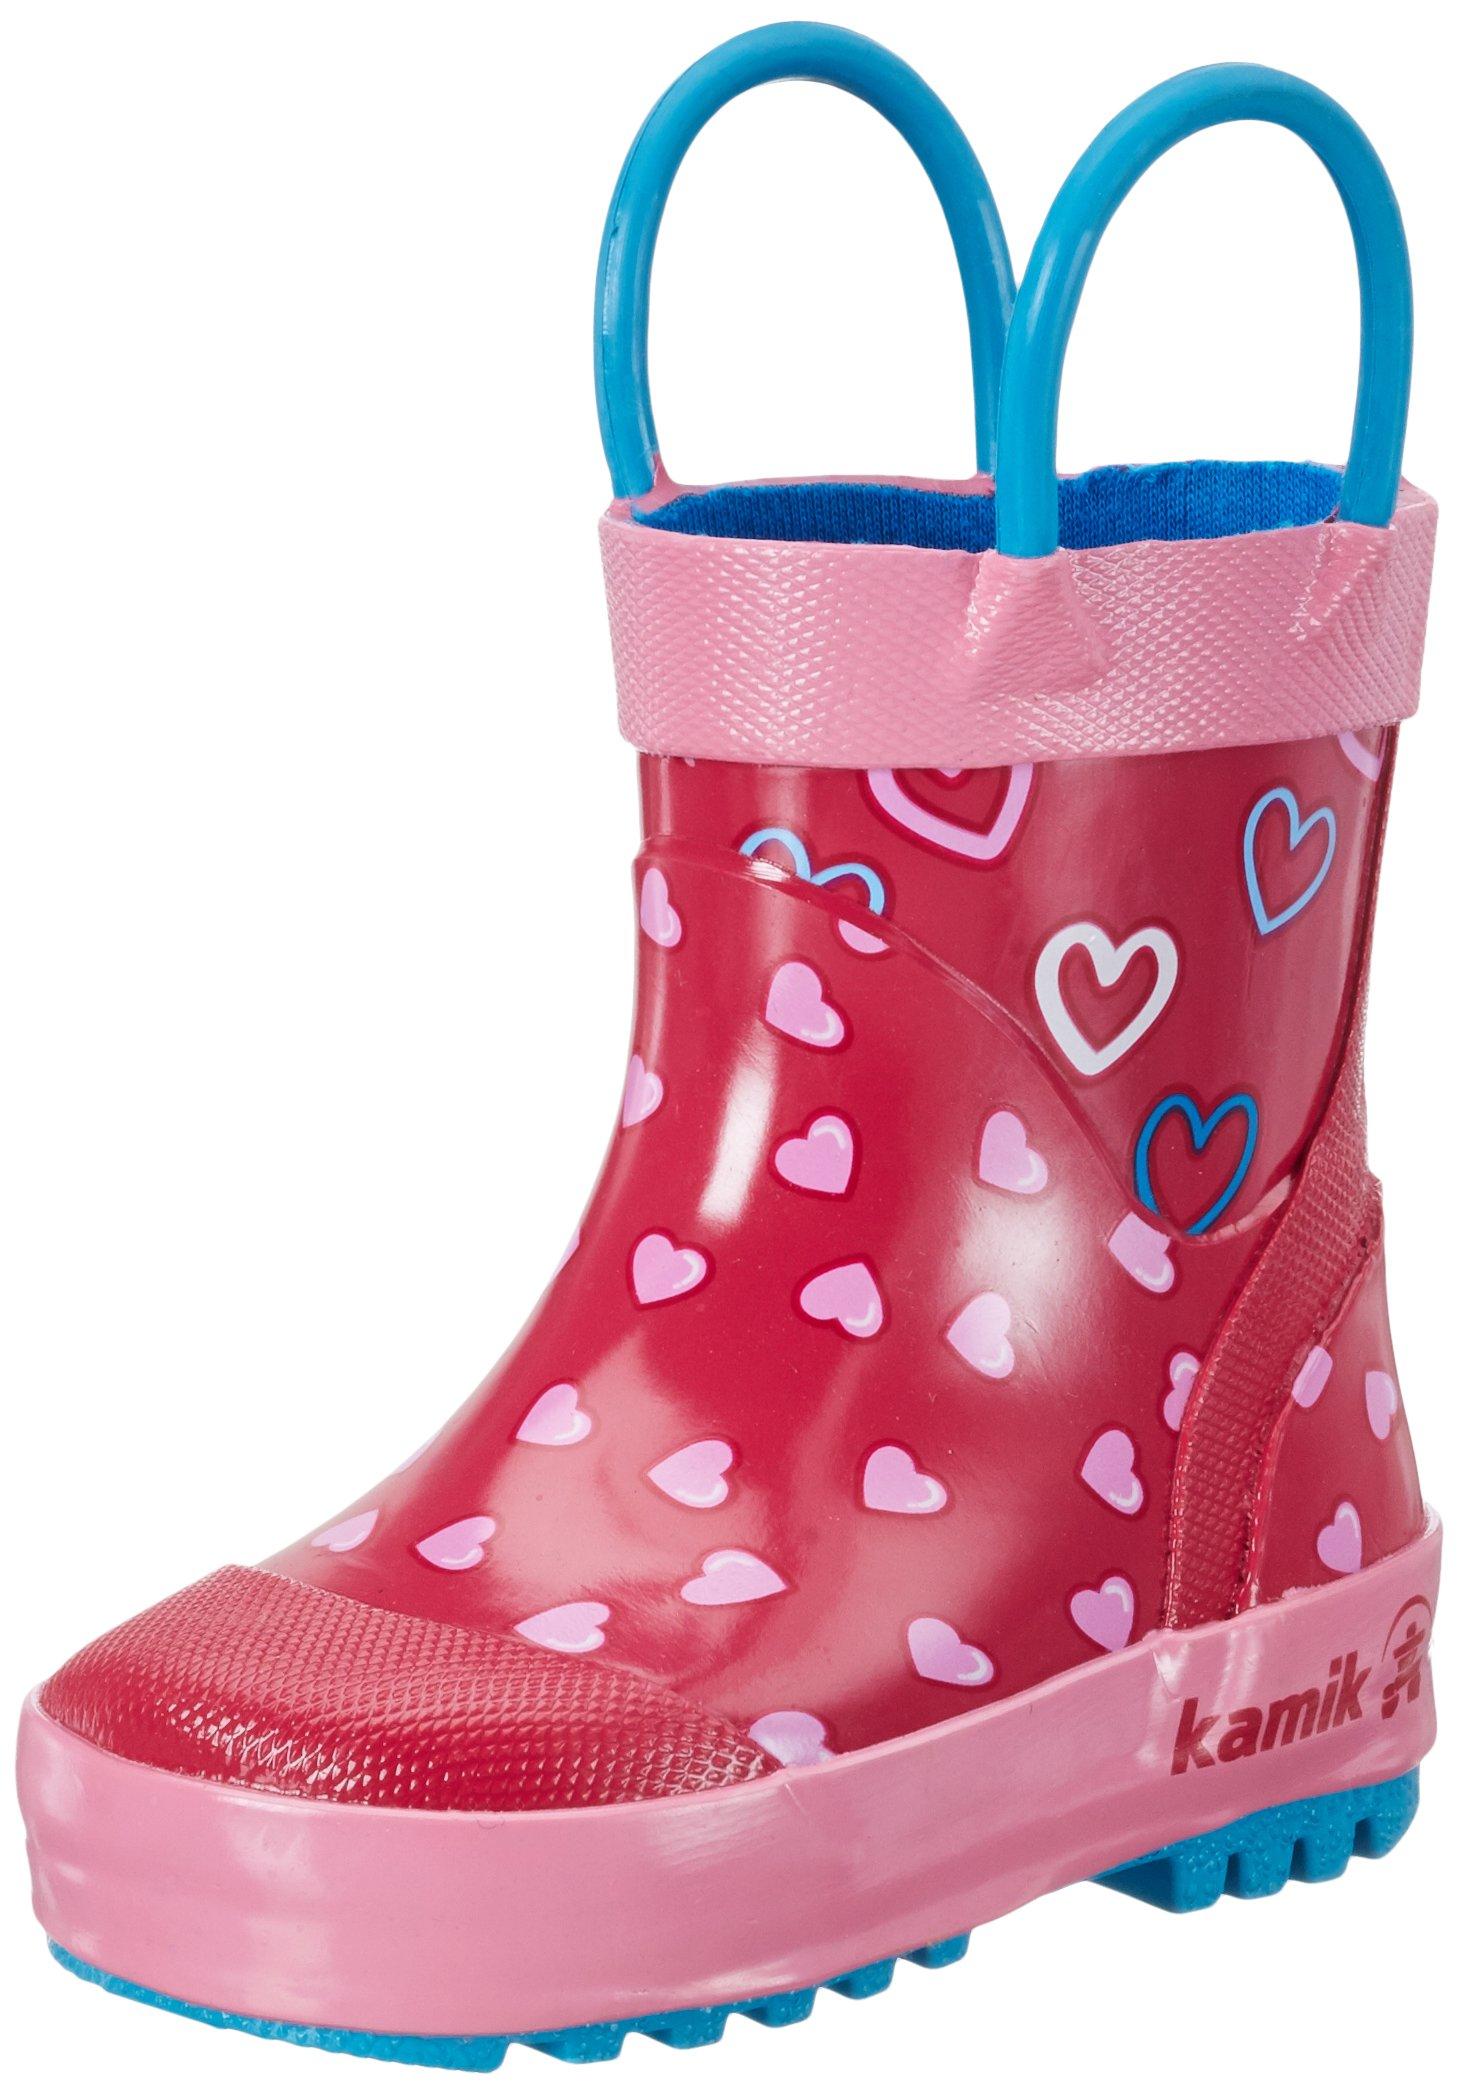 Kamik Girls' Cherish Rain Boot, Bright Rose, 13 M US Little Kid